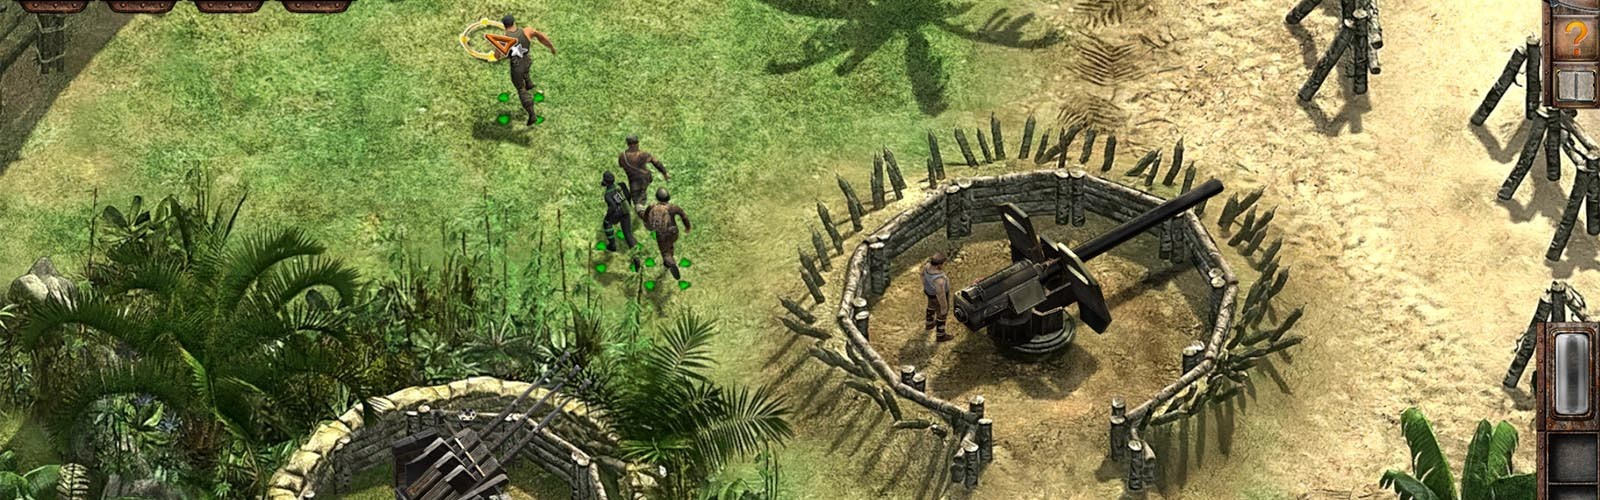 Commandos 2 & Praetorians: Hd Remaster Double Pack EUROPE